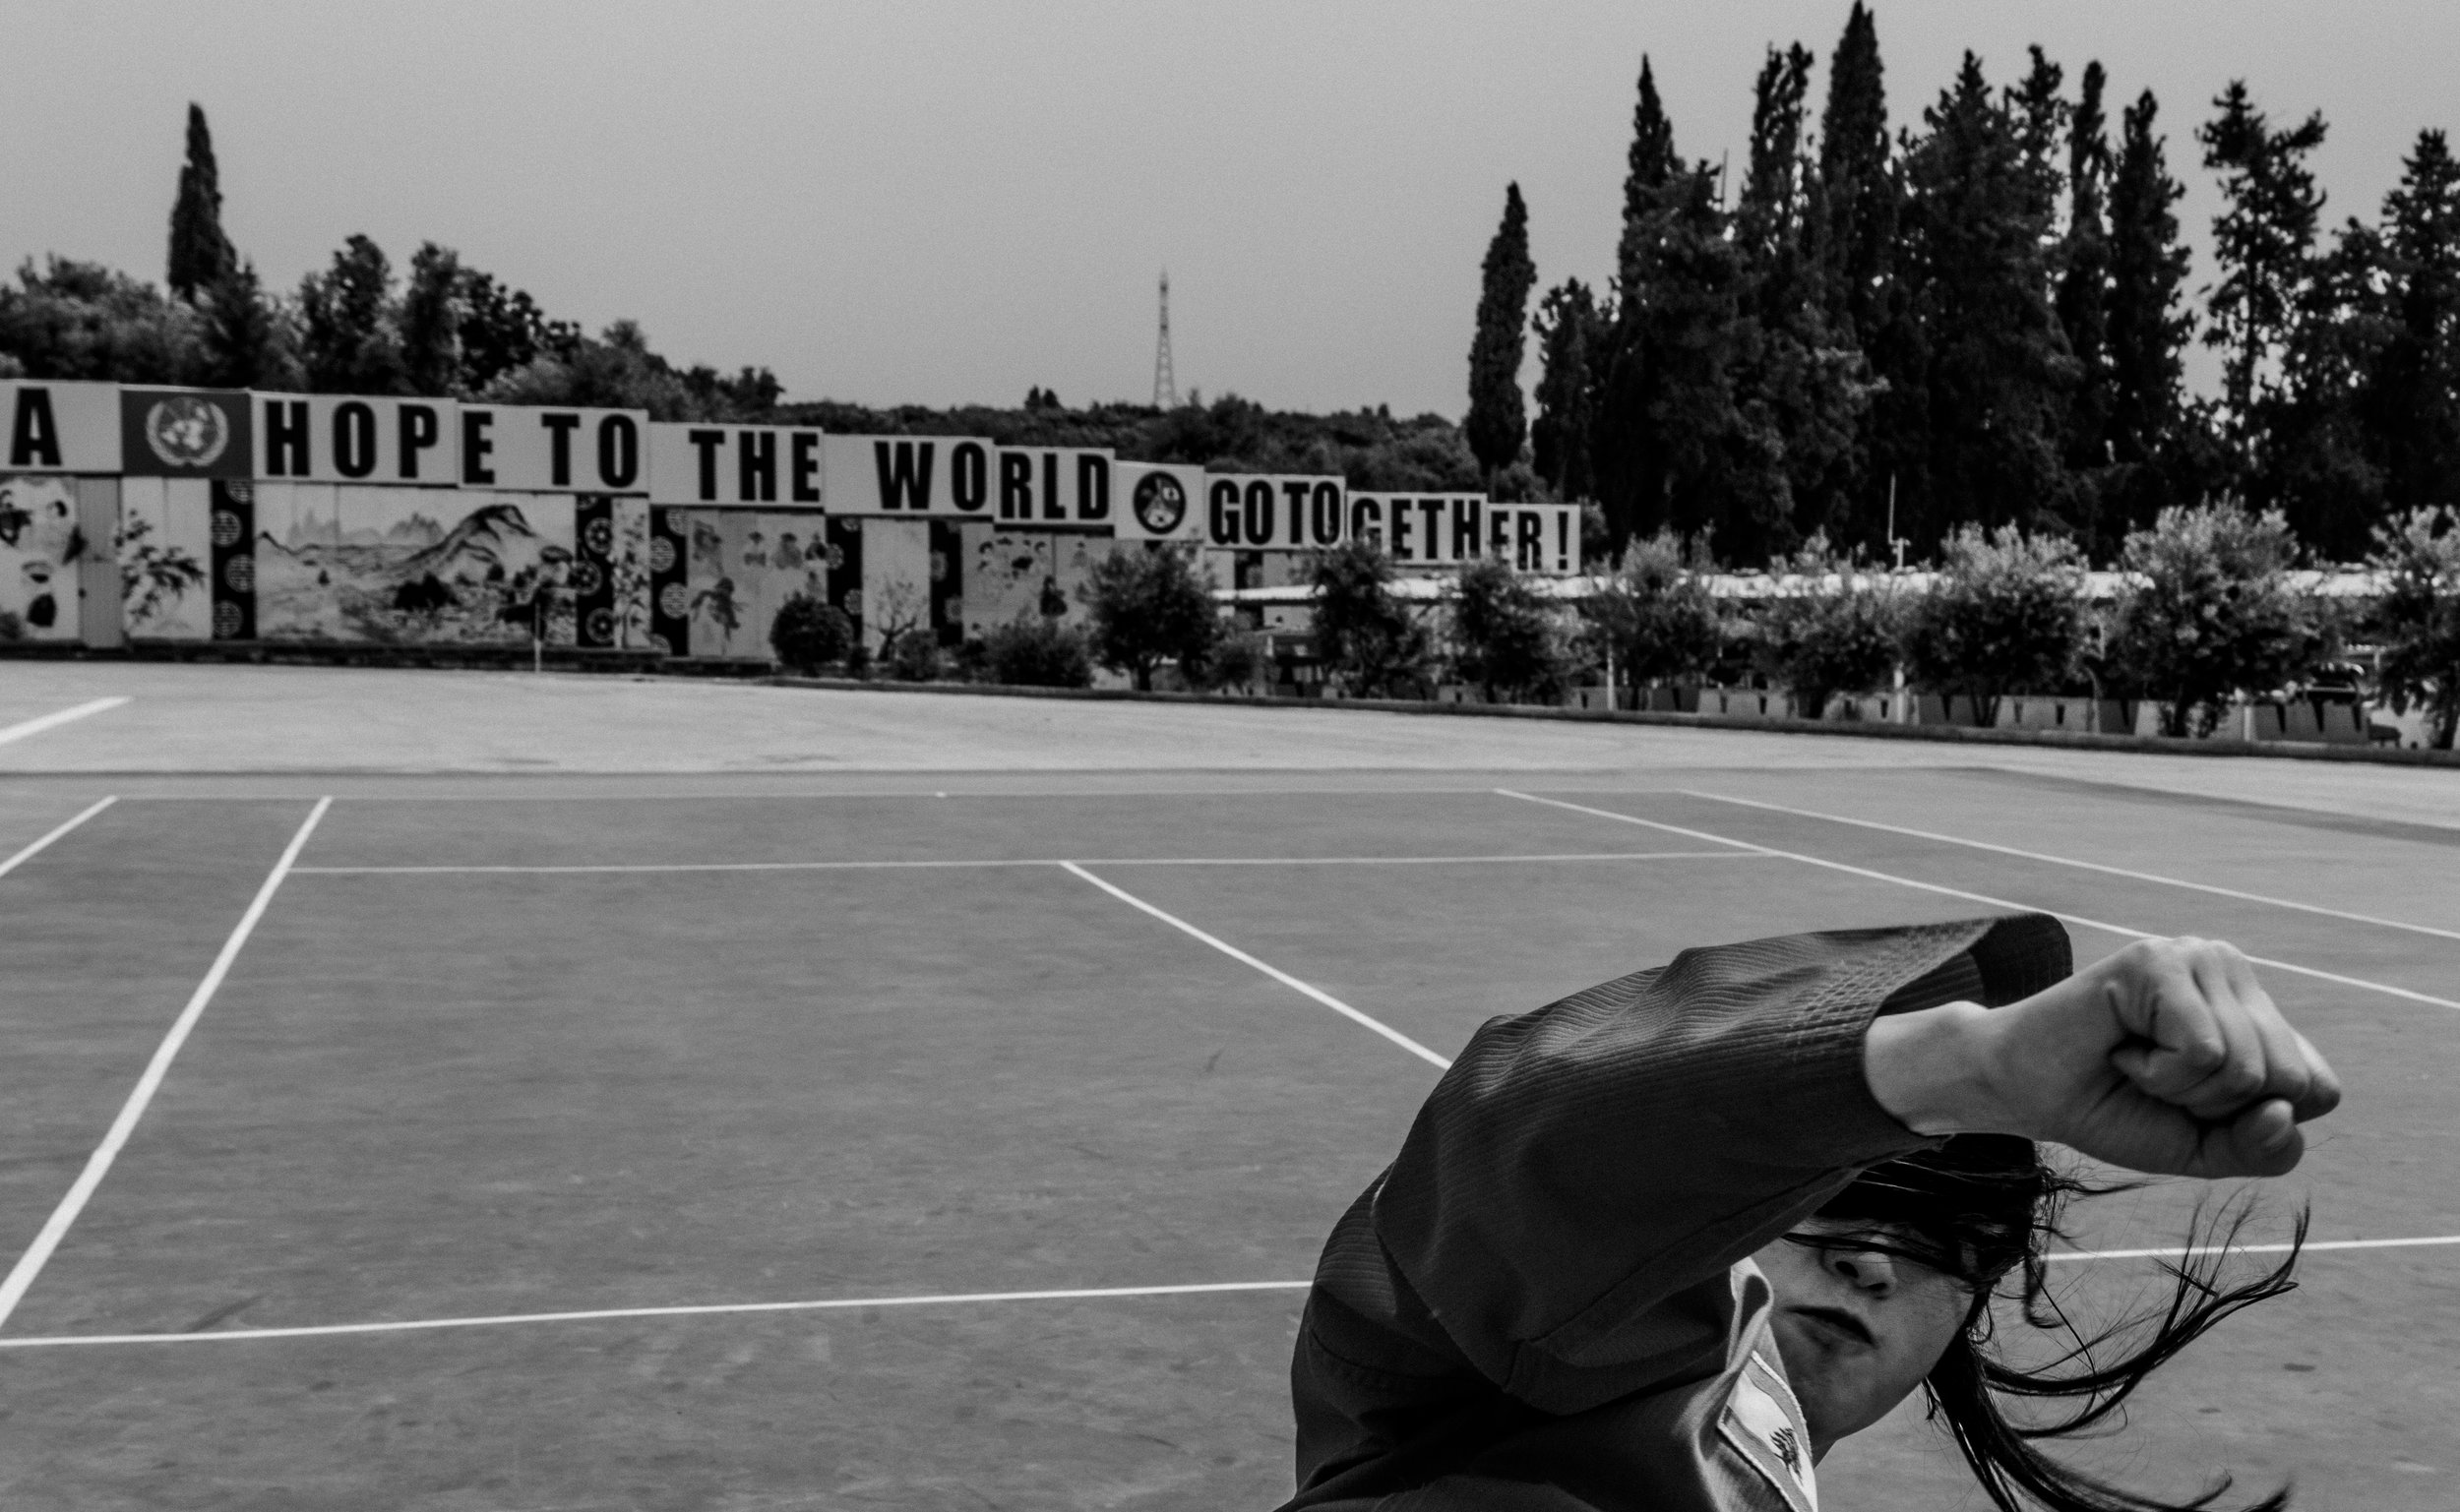 May 4, 2018, UNIFIL- SFC Kung Ah Park (30) kicks and breaks a board.